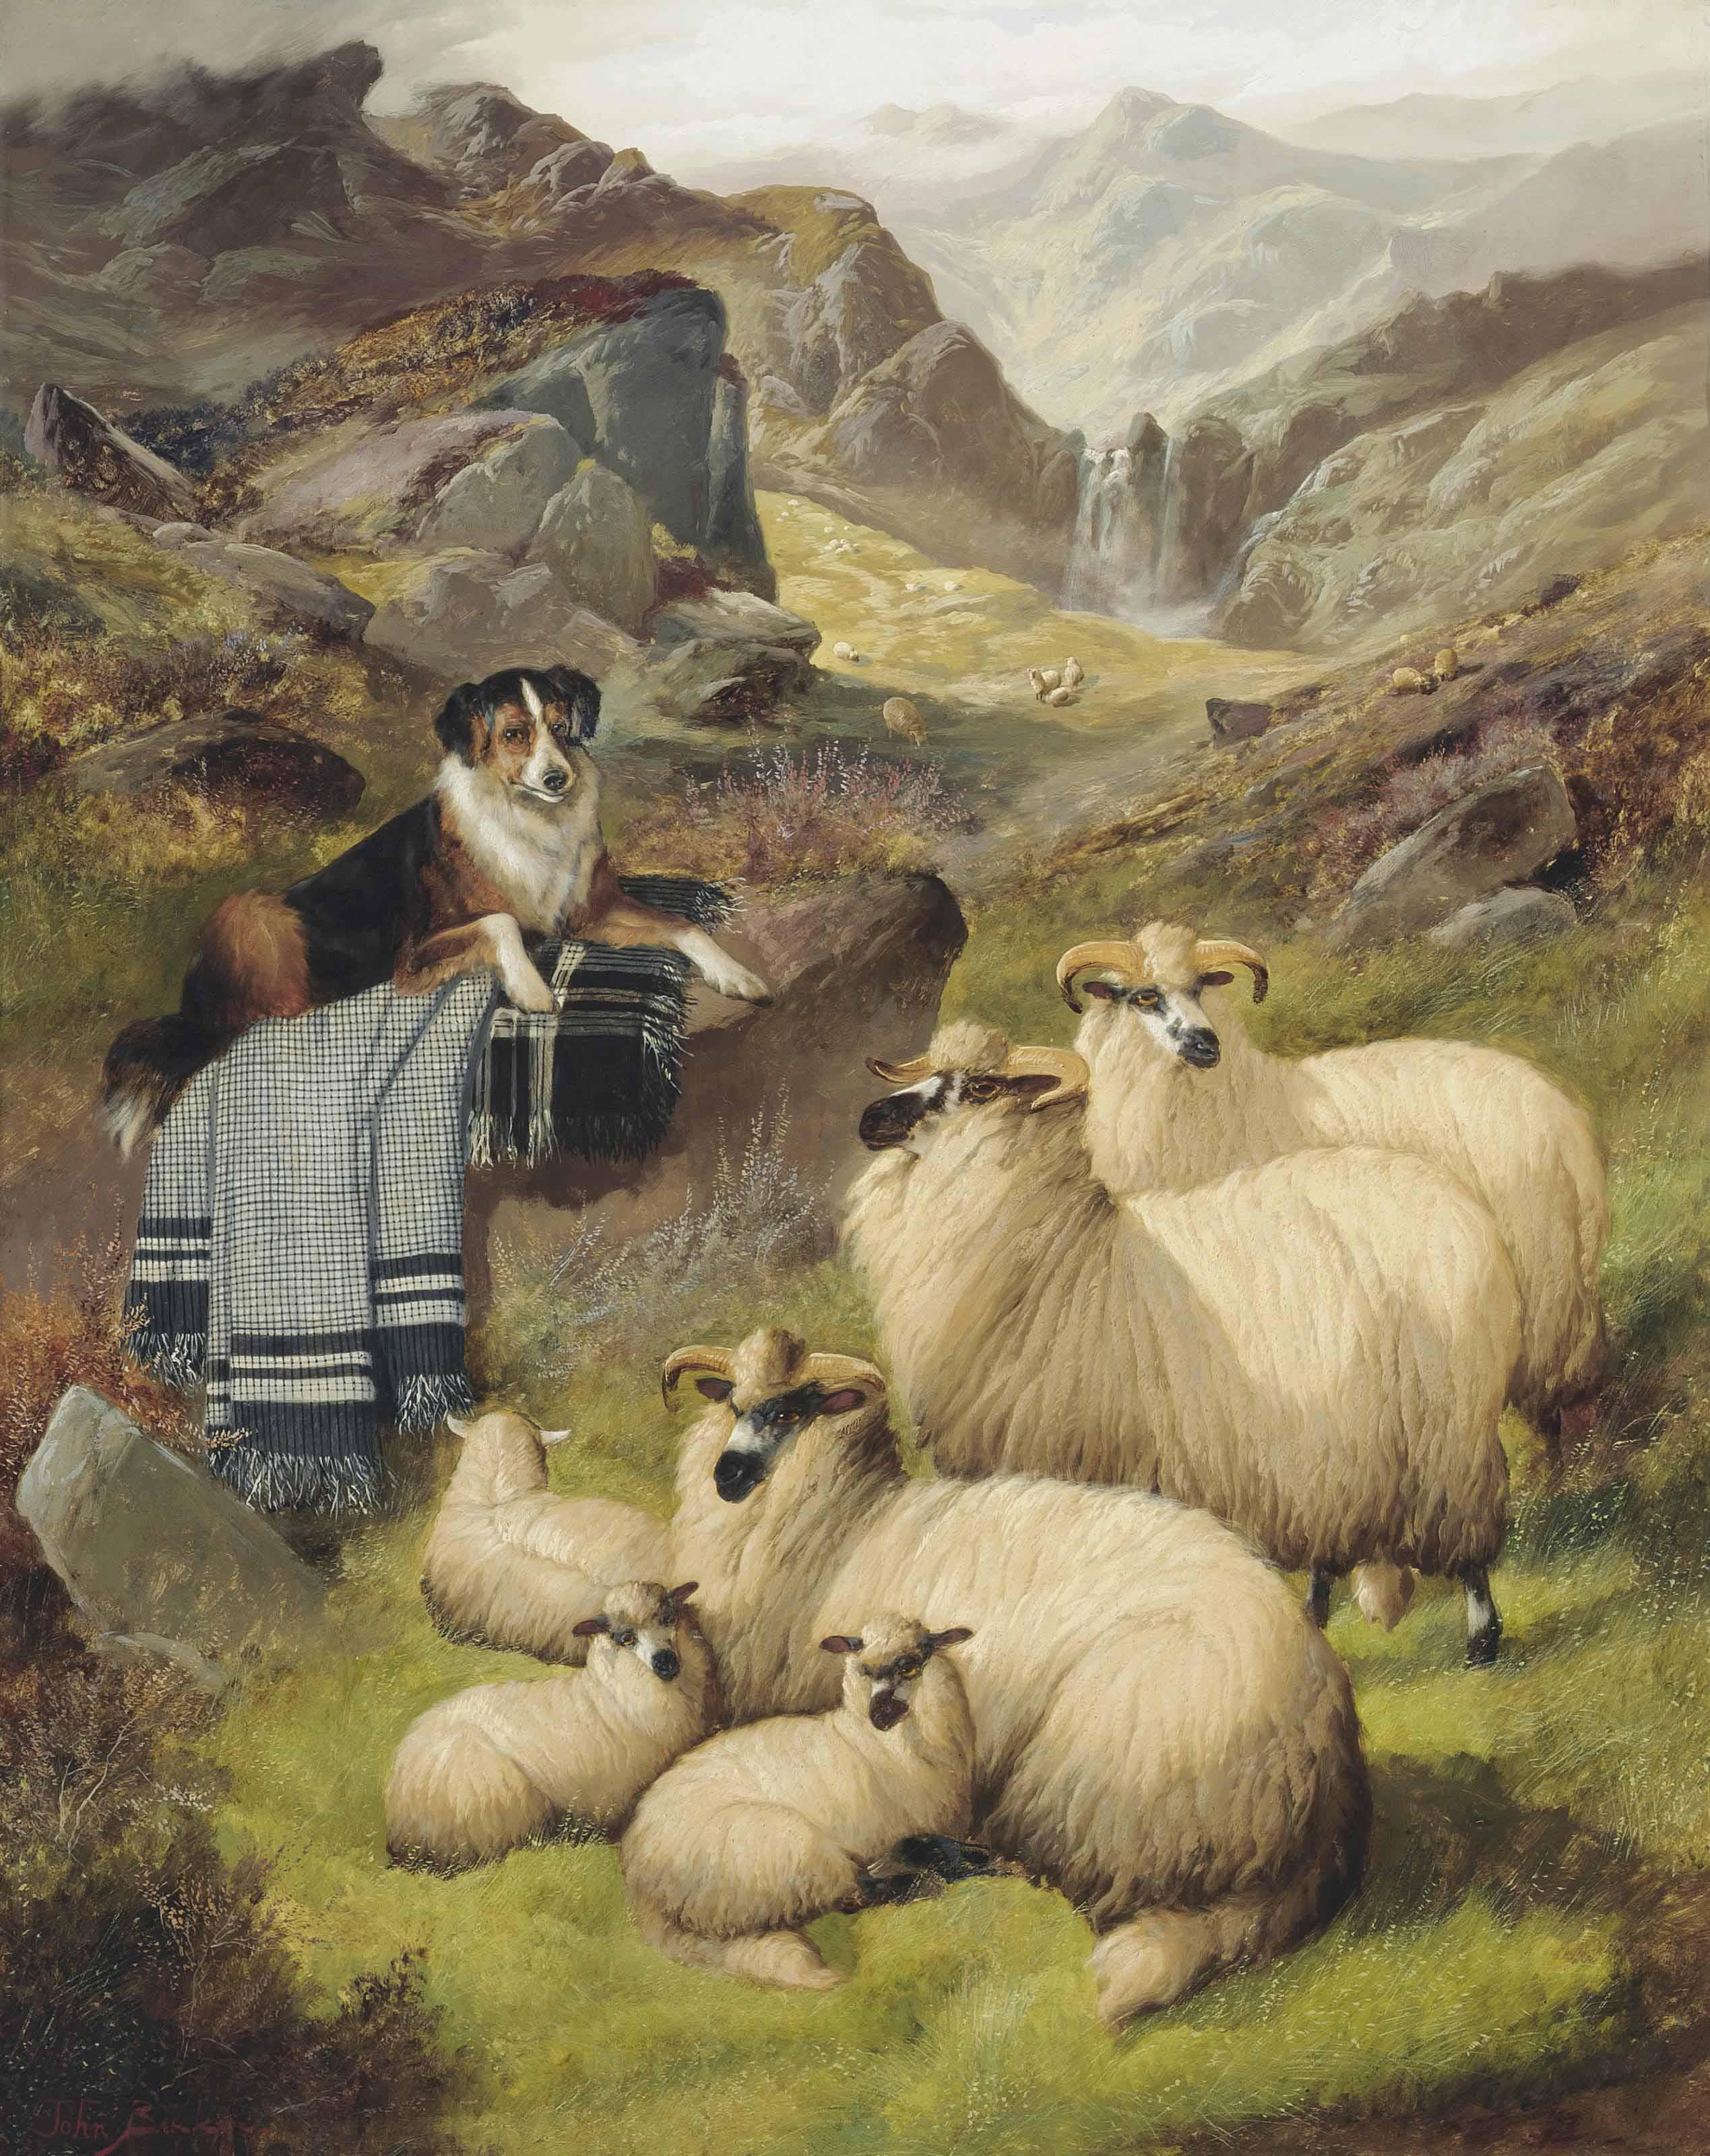 Guarding the sheep